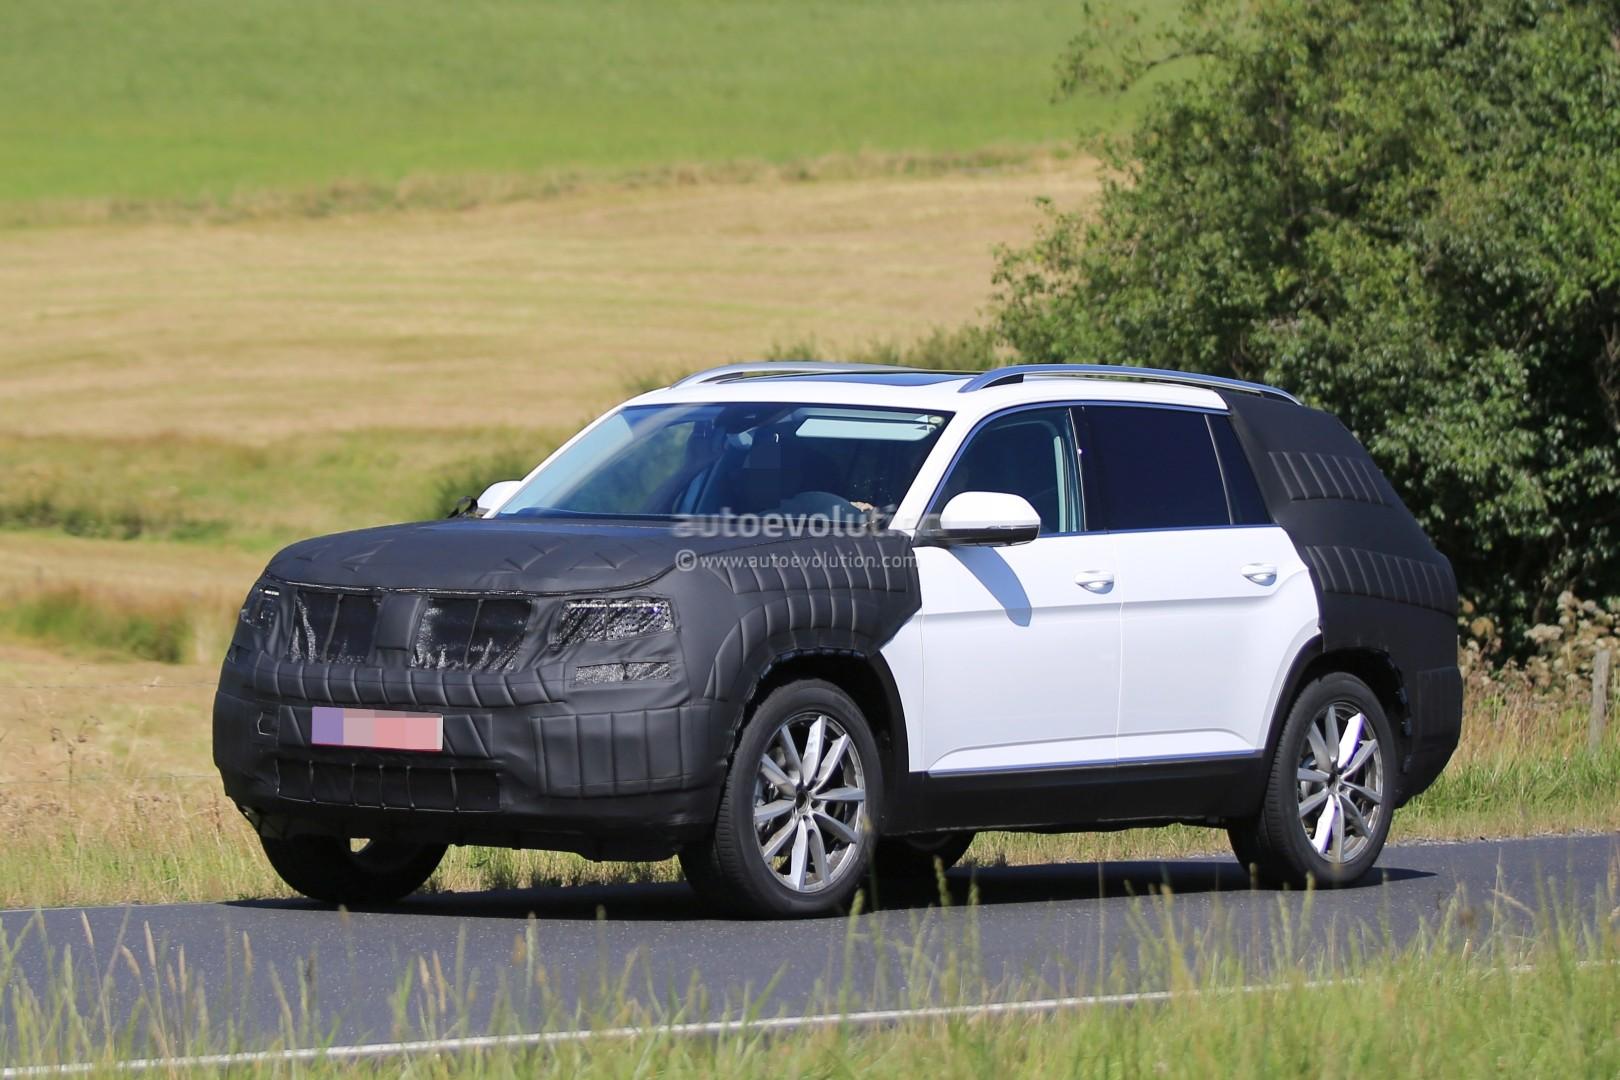 2017 Volkswagen 7-Seater US Market SUV Spied Testing Its Extended Golf Platform - autoevolution